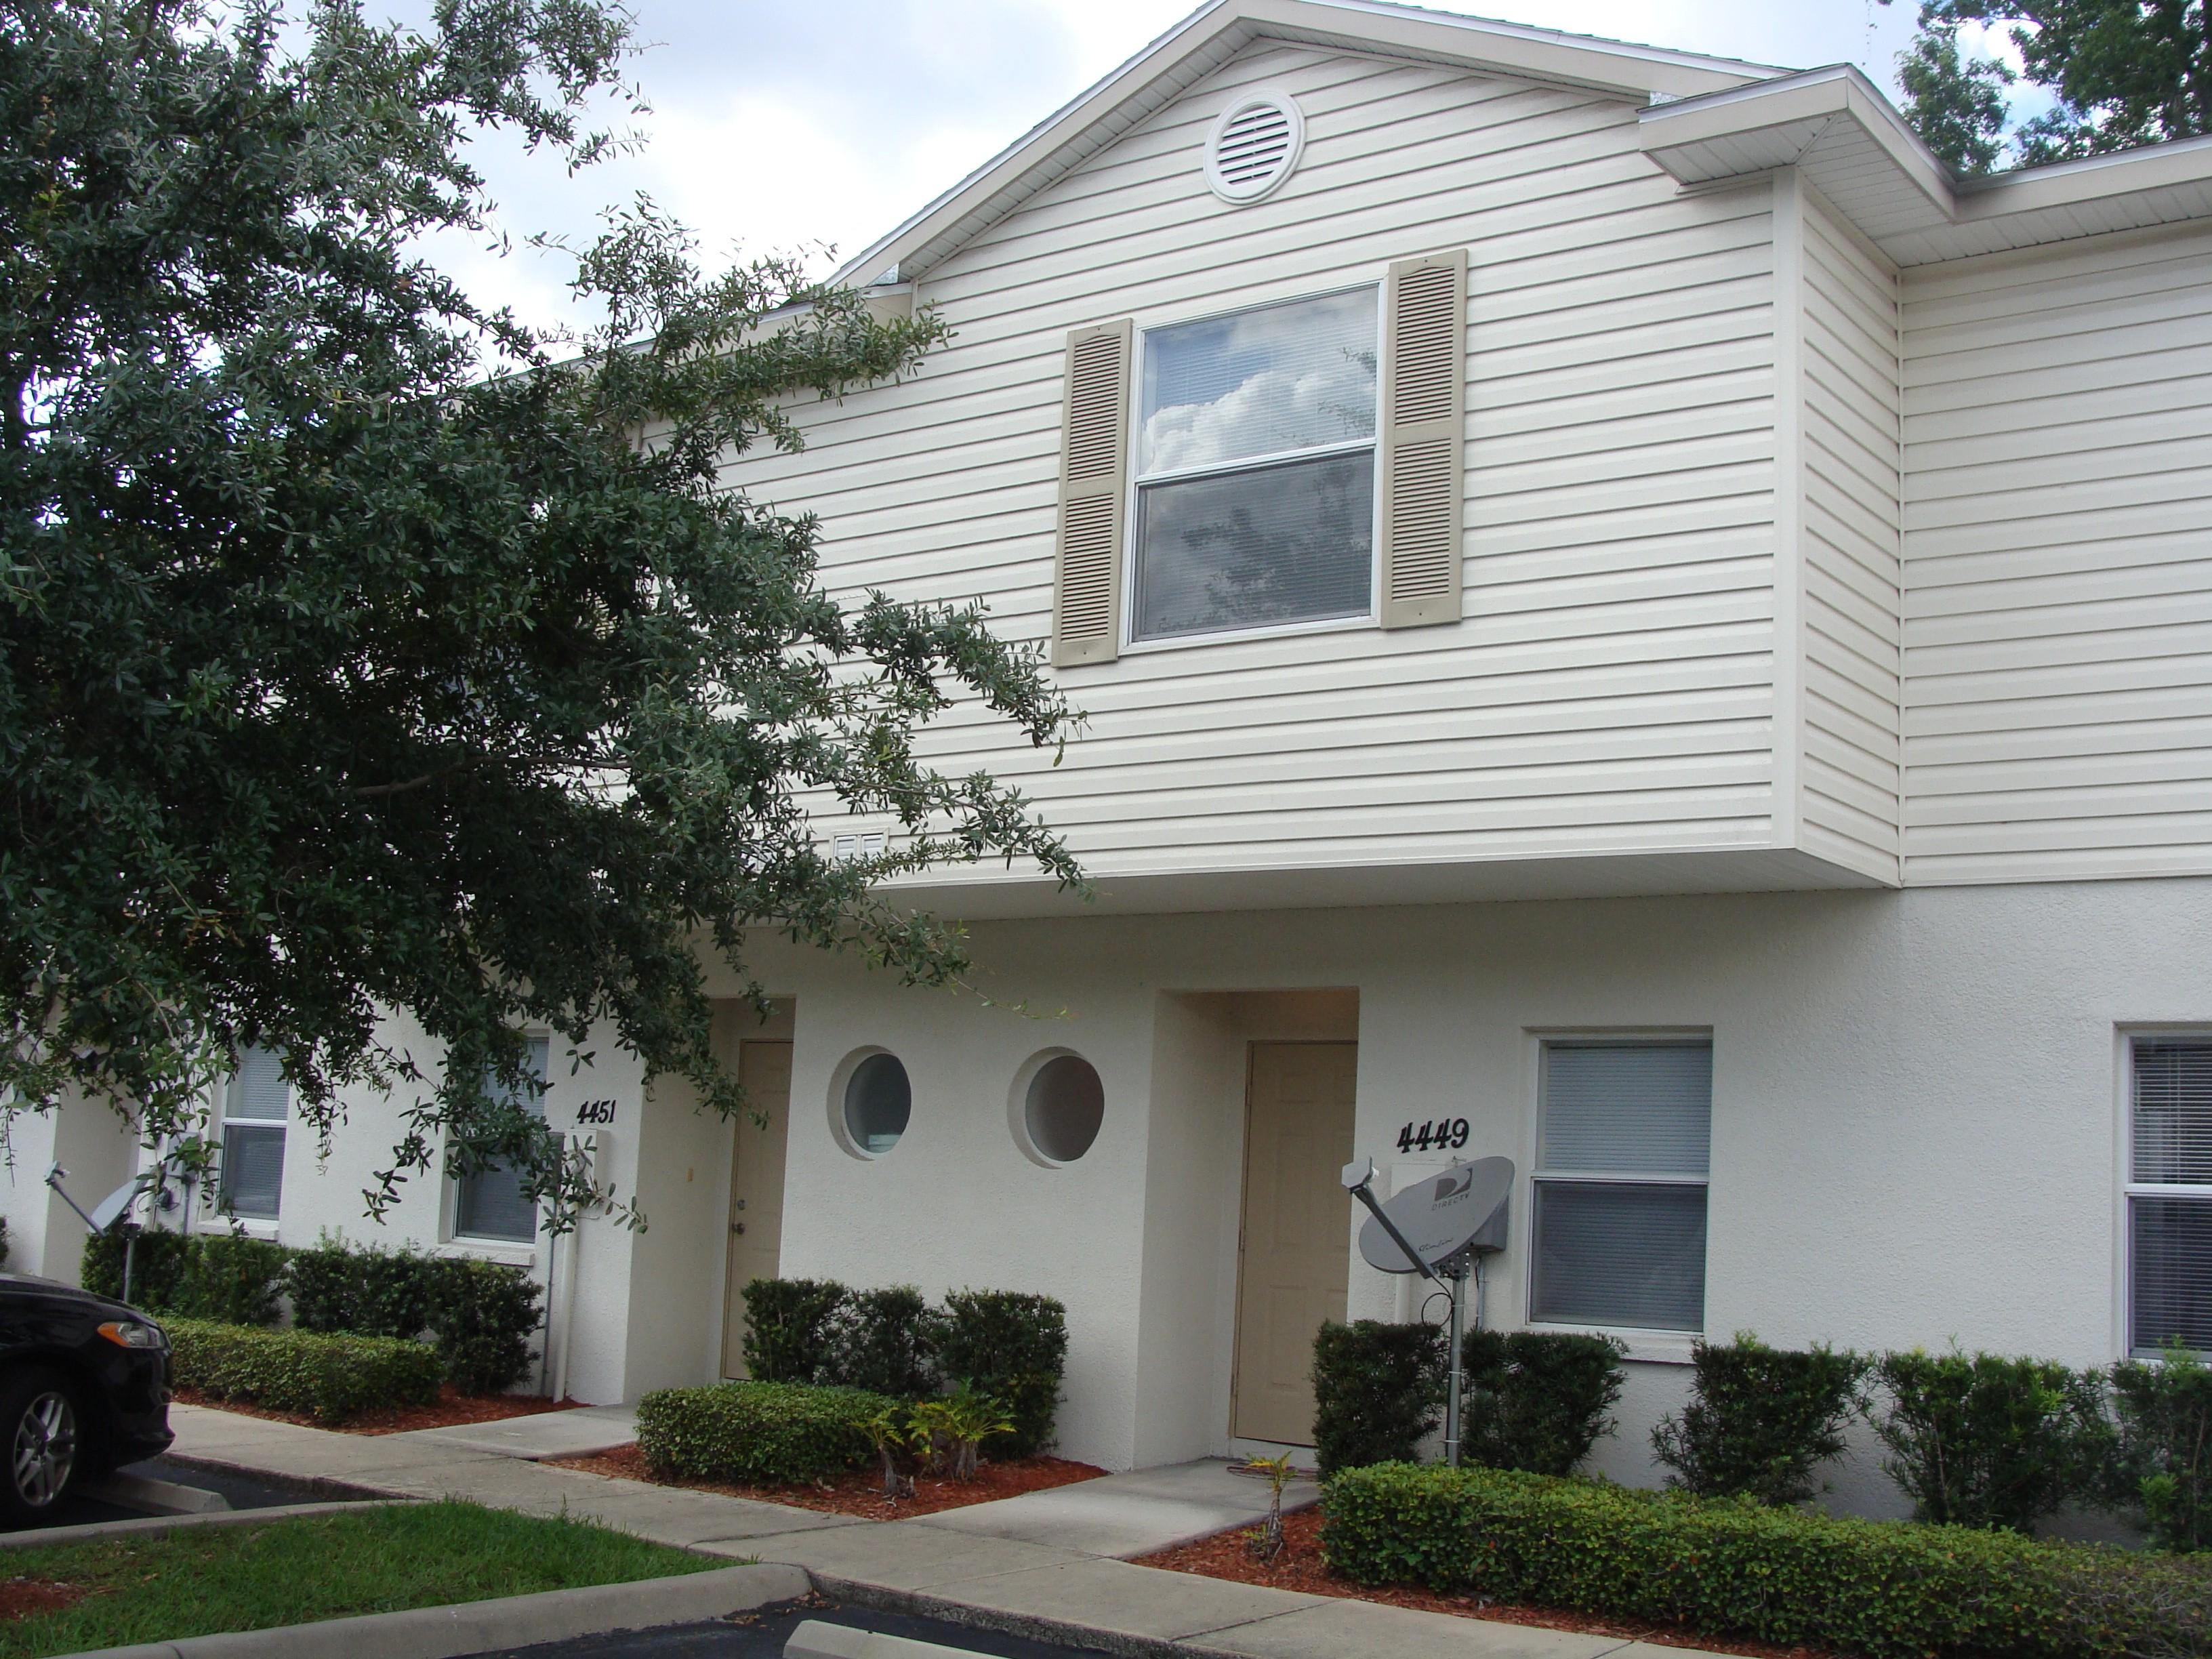 4449 Har Paul Cir Tampa Fl 33614 3 Bedroom Apartment For Rent Padmapper